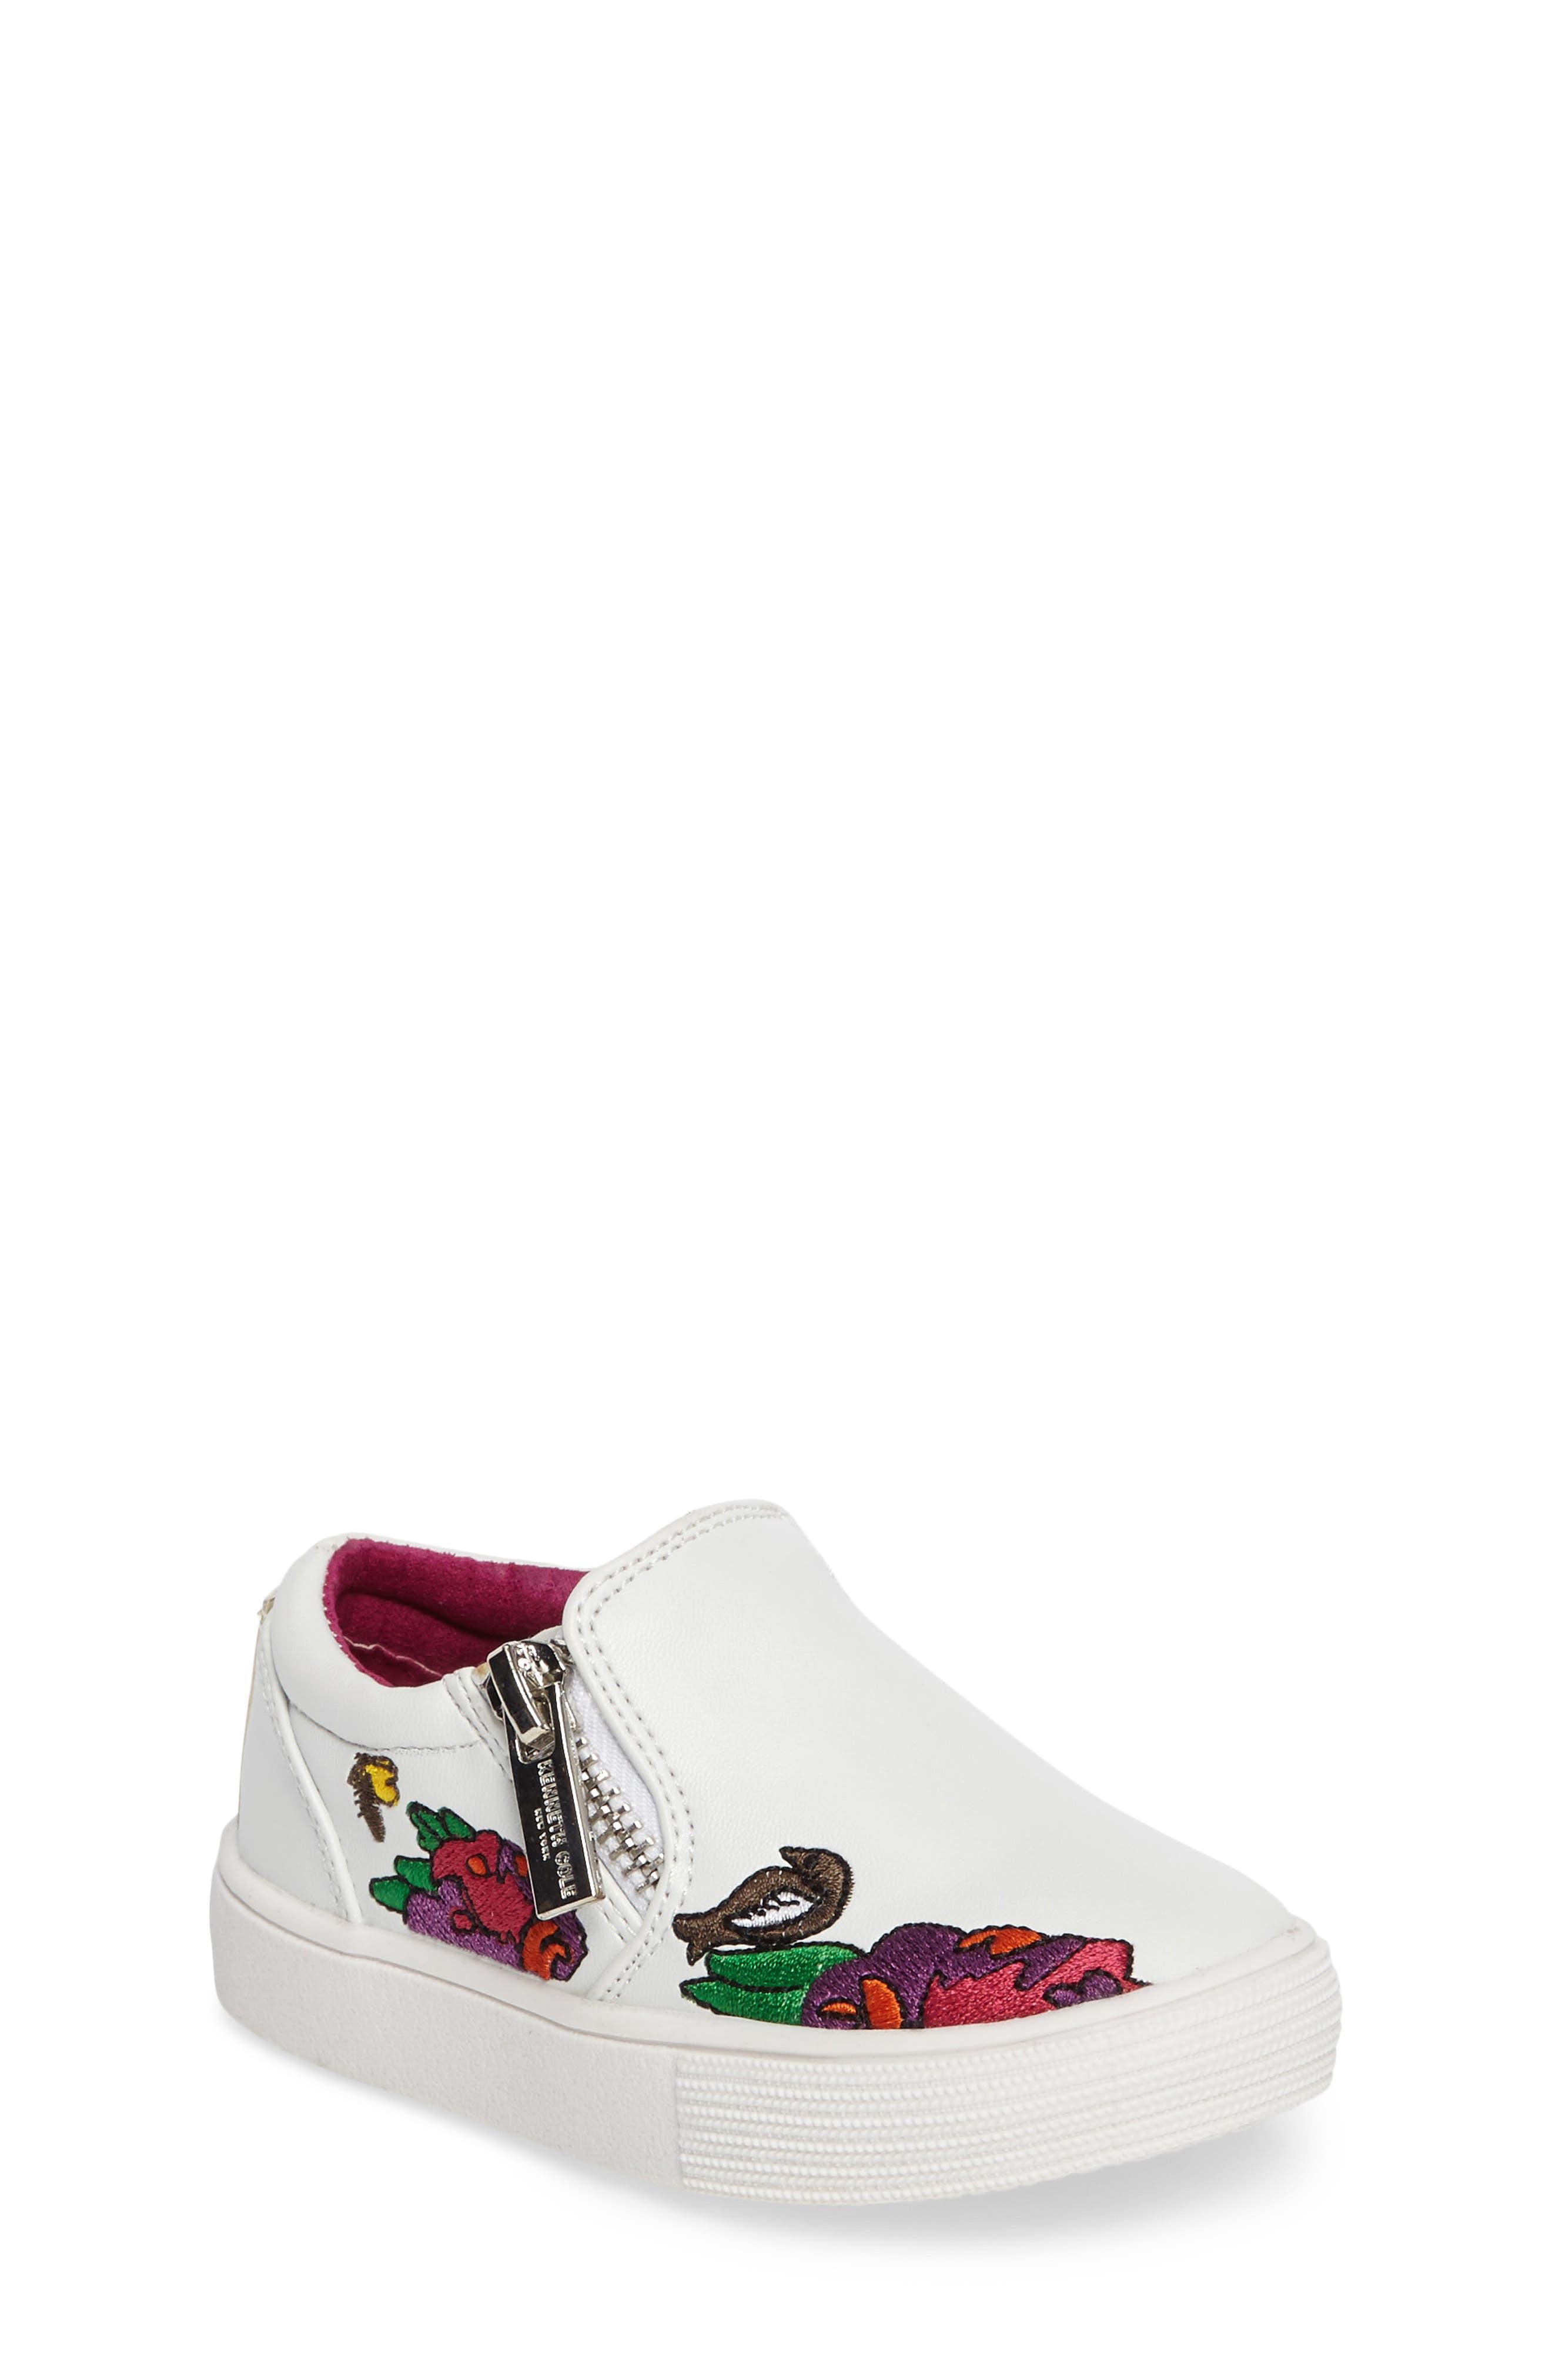 Alternate Image 1 Selected - Kenneth Cole New York Kam Dory Embroidered Zip Sneaker (Walker & Toddler)